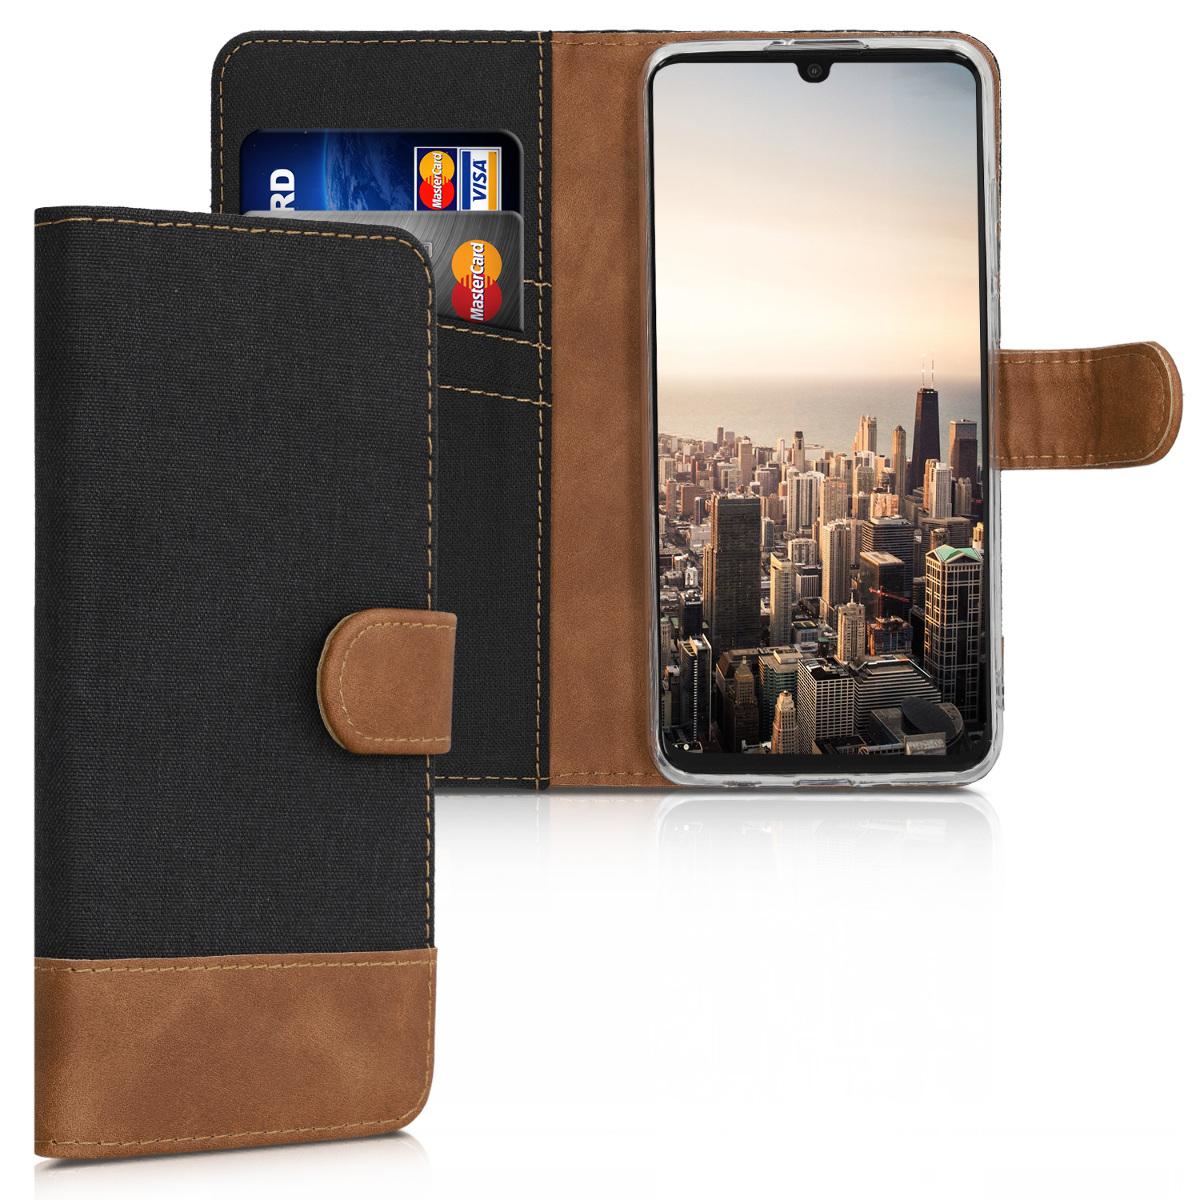 KW Θήκη - Πορτοφόλι Huawei P30 Lite - Black / Brown (47502.03)